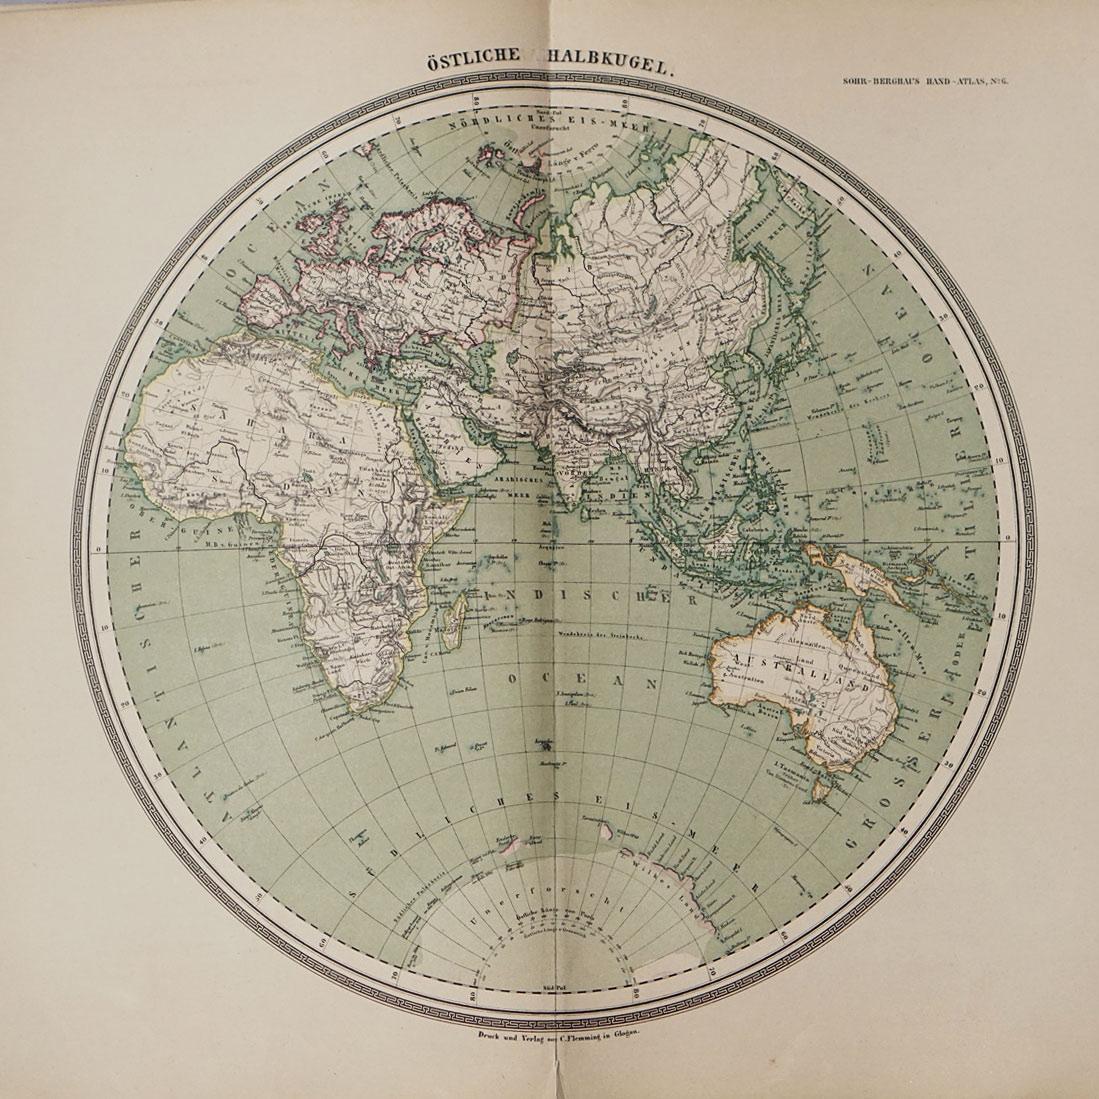 Eastern hemisphere map from 1988 in Sohr Berghaus Handatlas